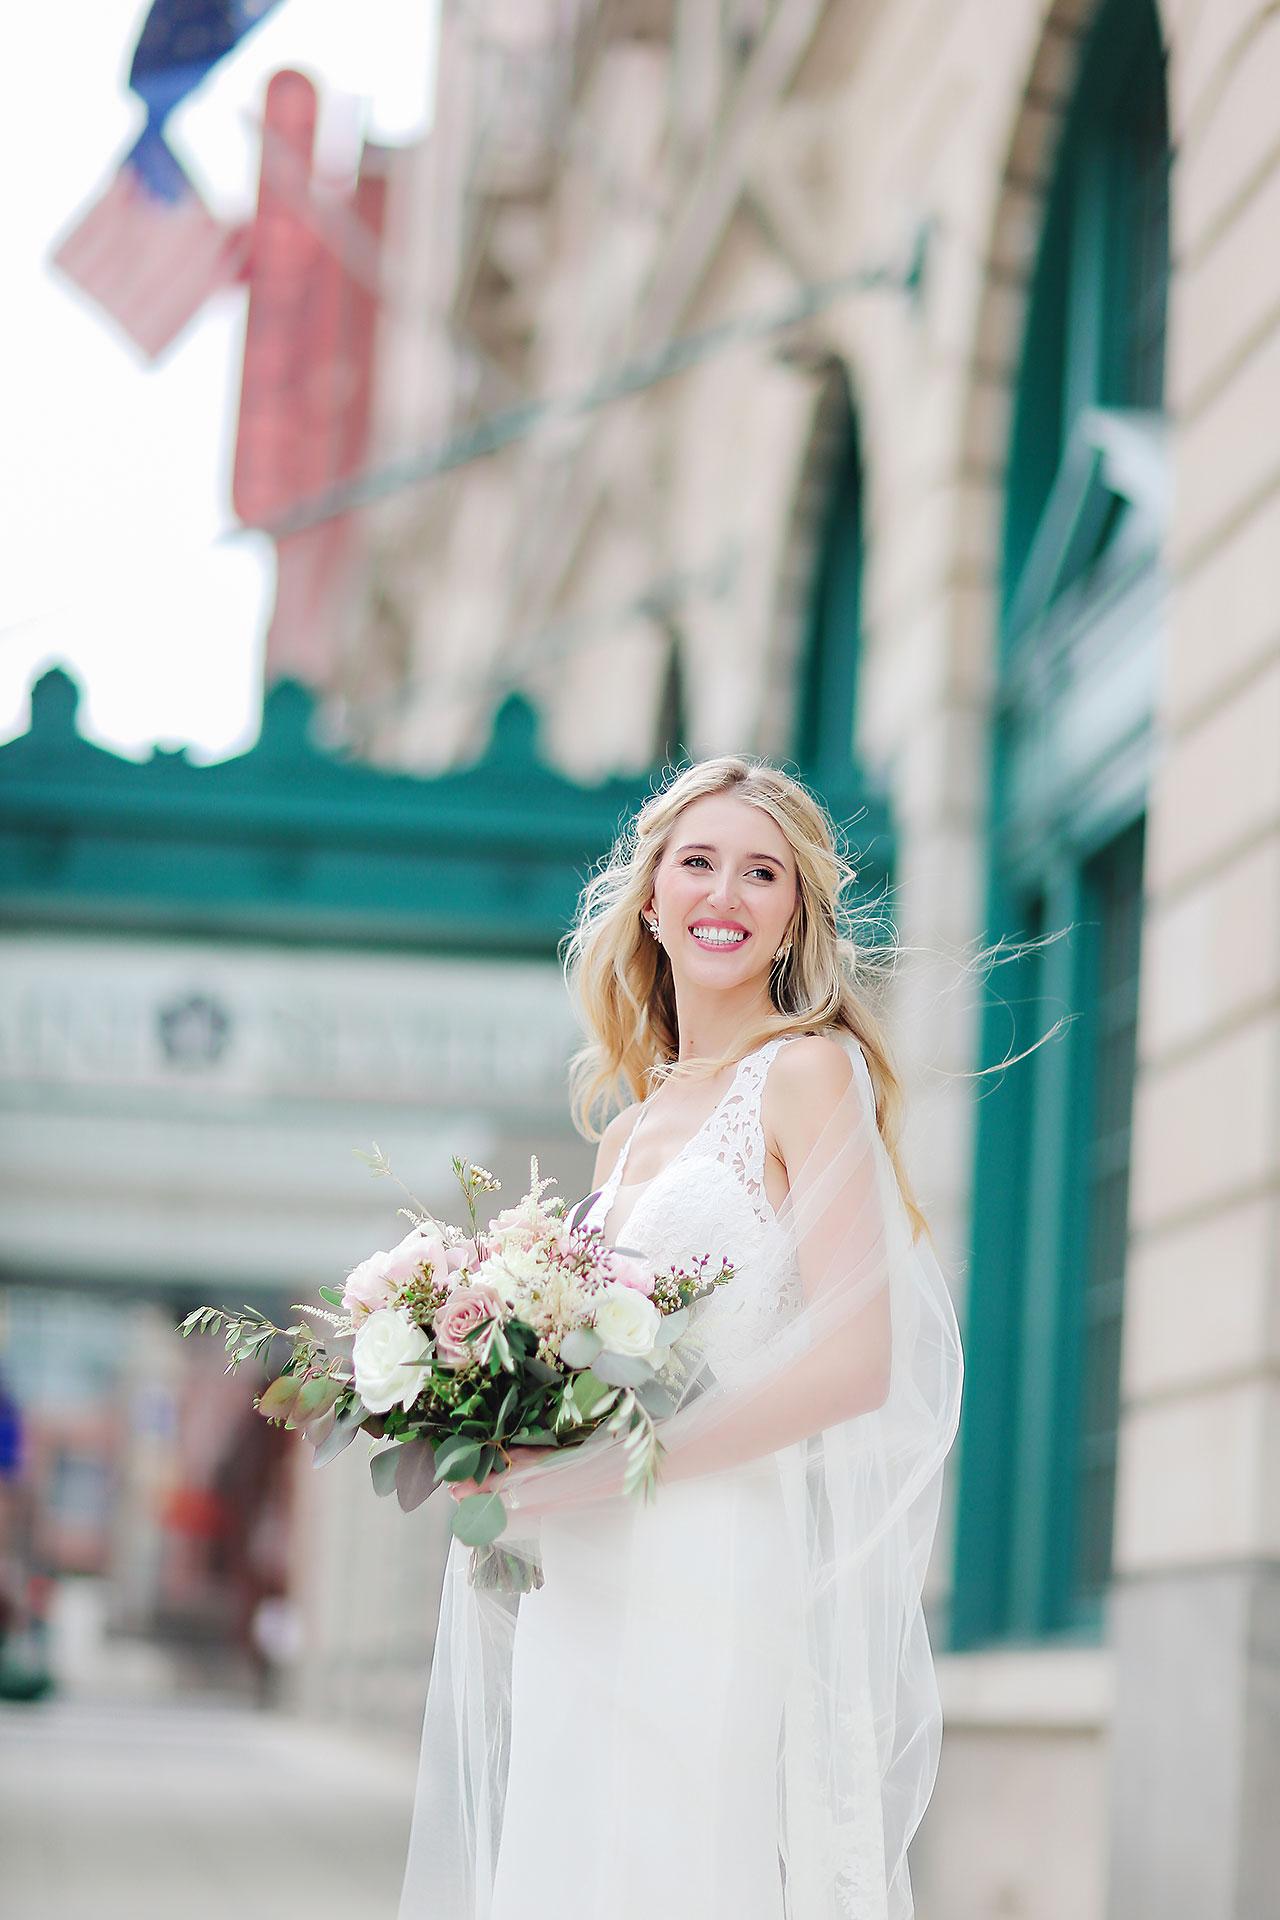 Allison Jeff Union Station Crowne Plaza Indianapolis wedding 073